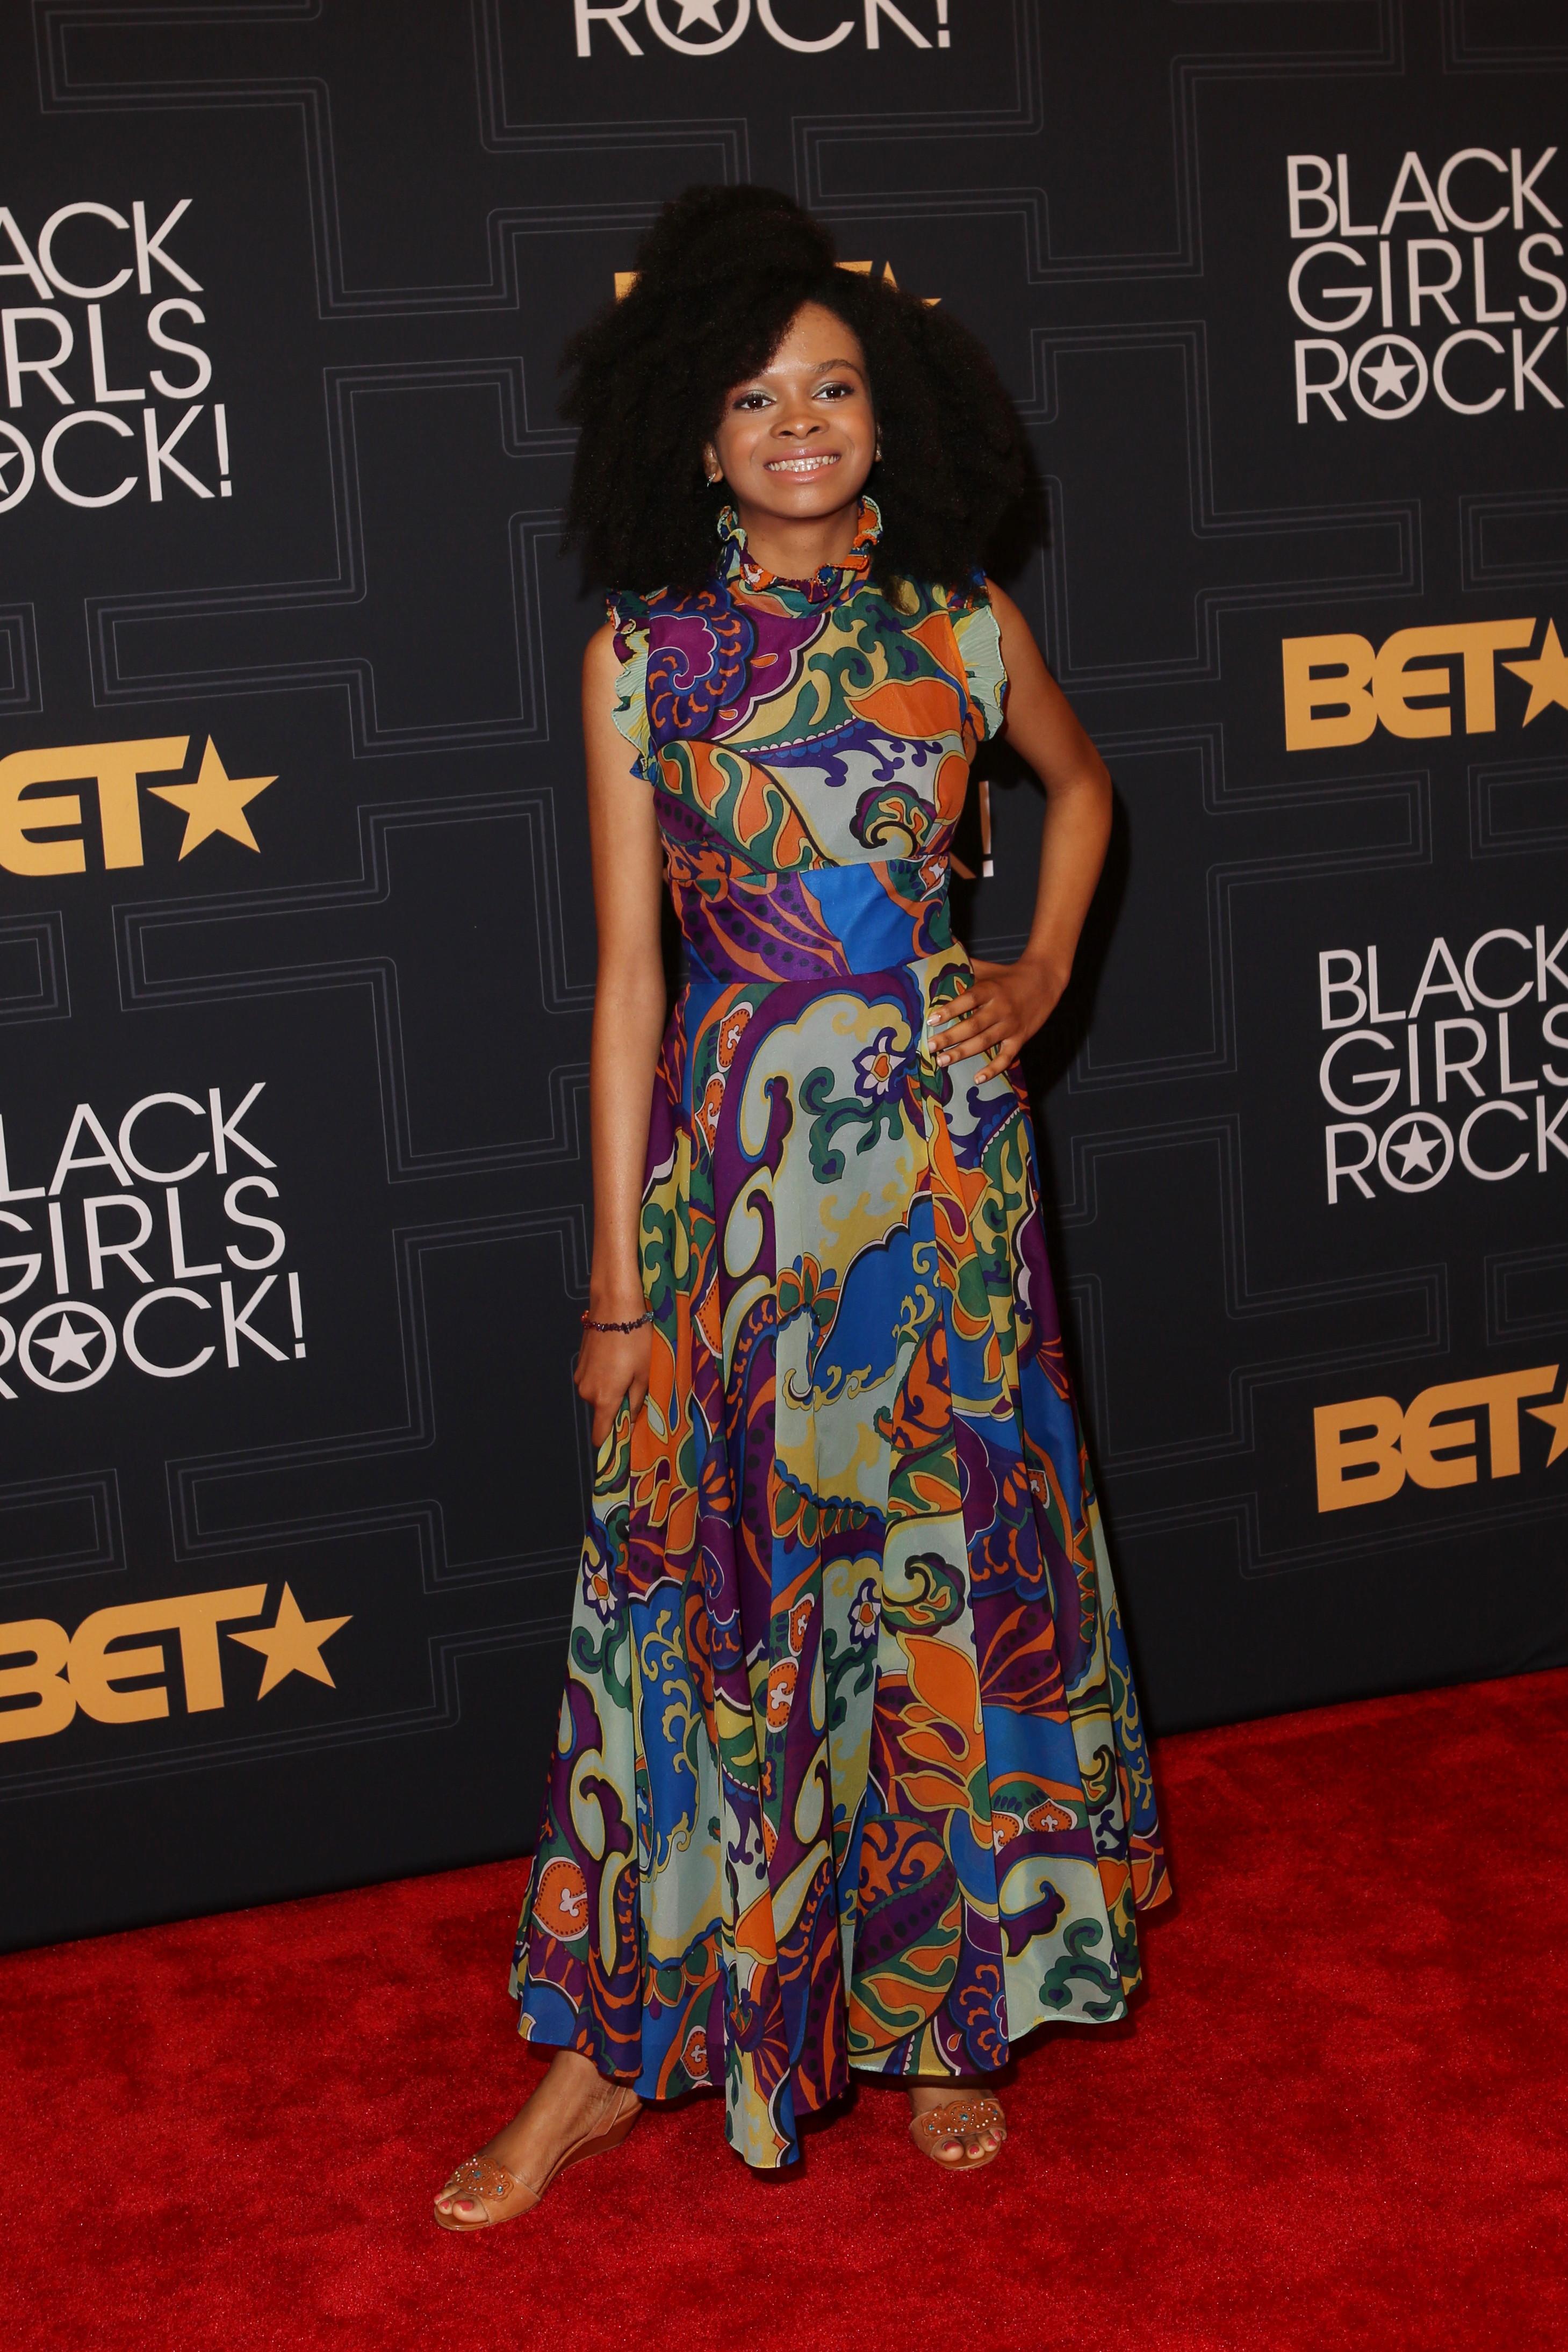 BET Black Girls Rock!